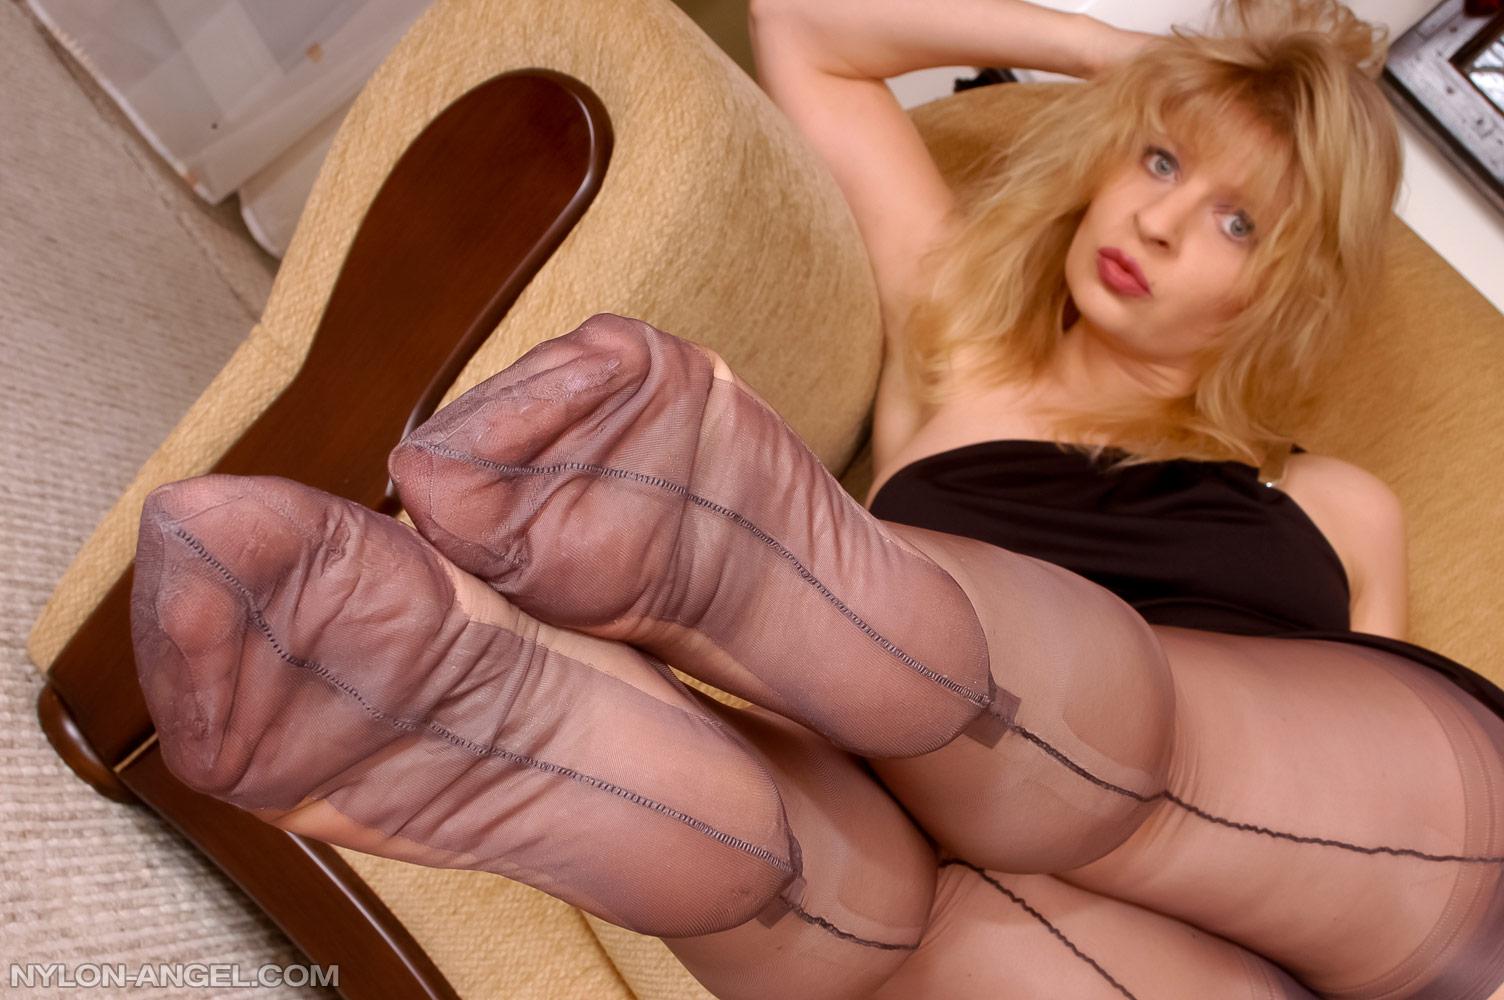 Russian Lesbians Nylon Feet